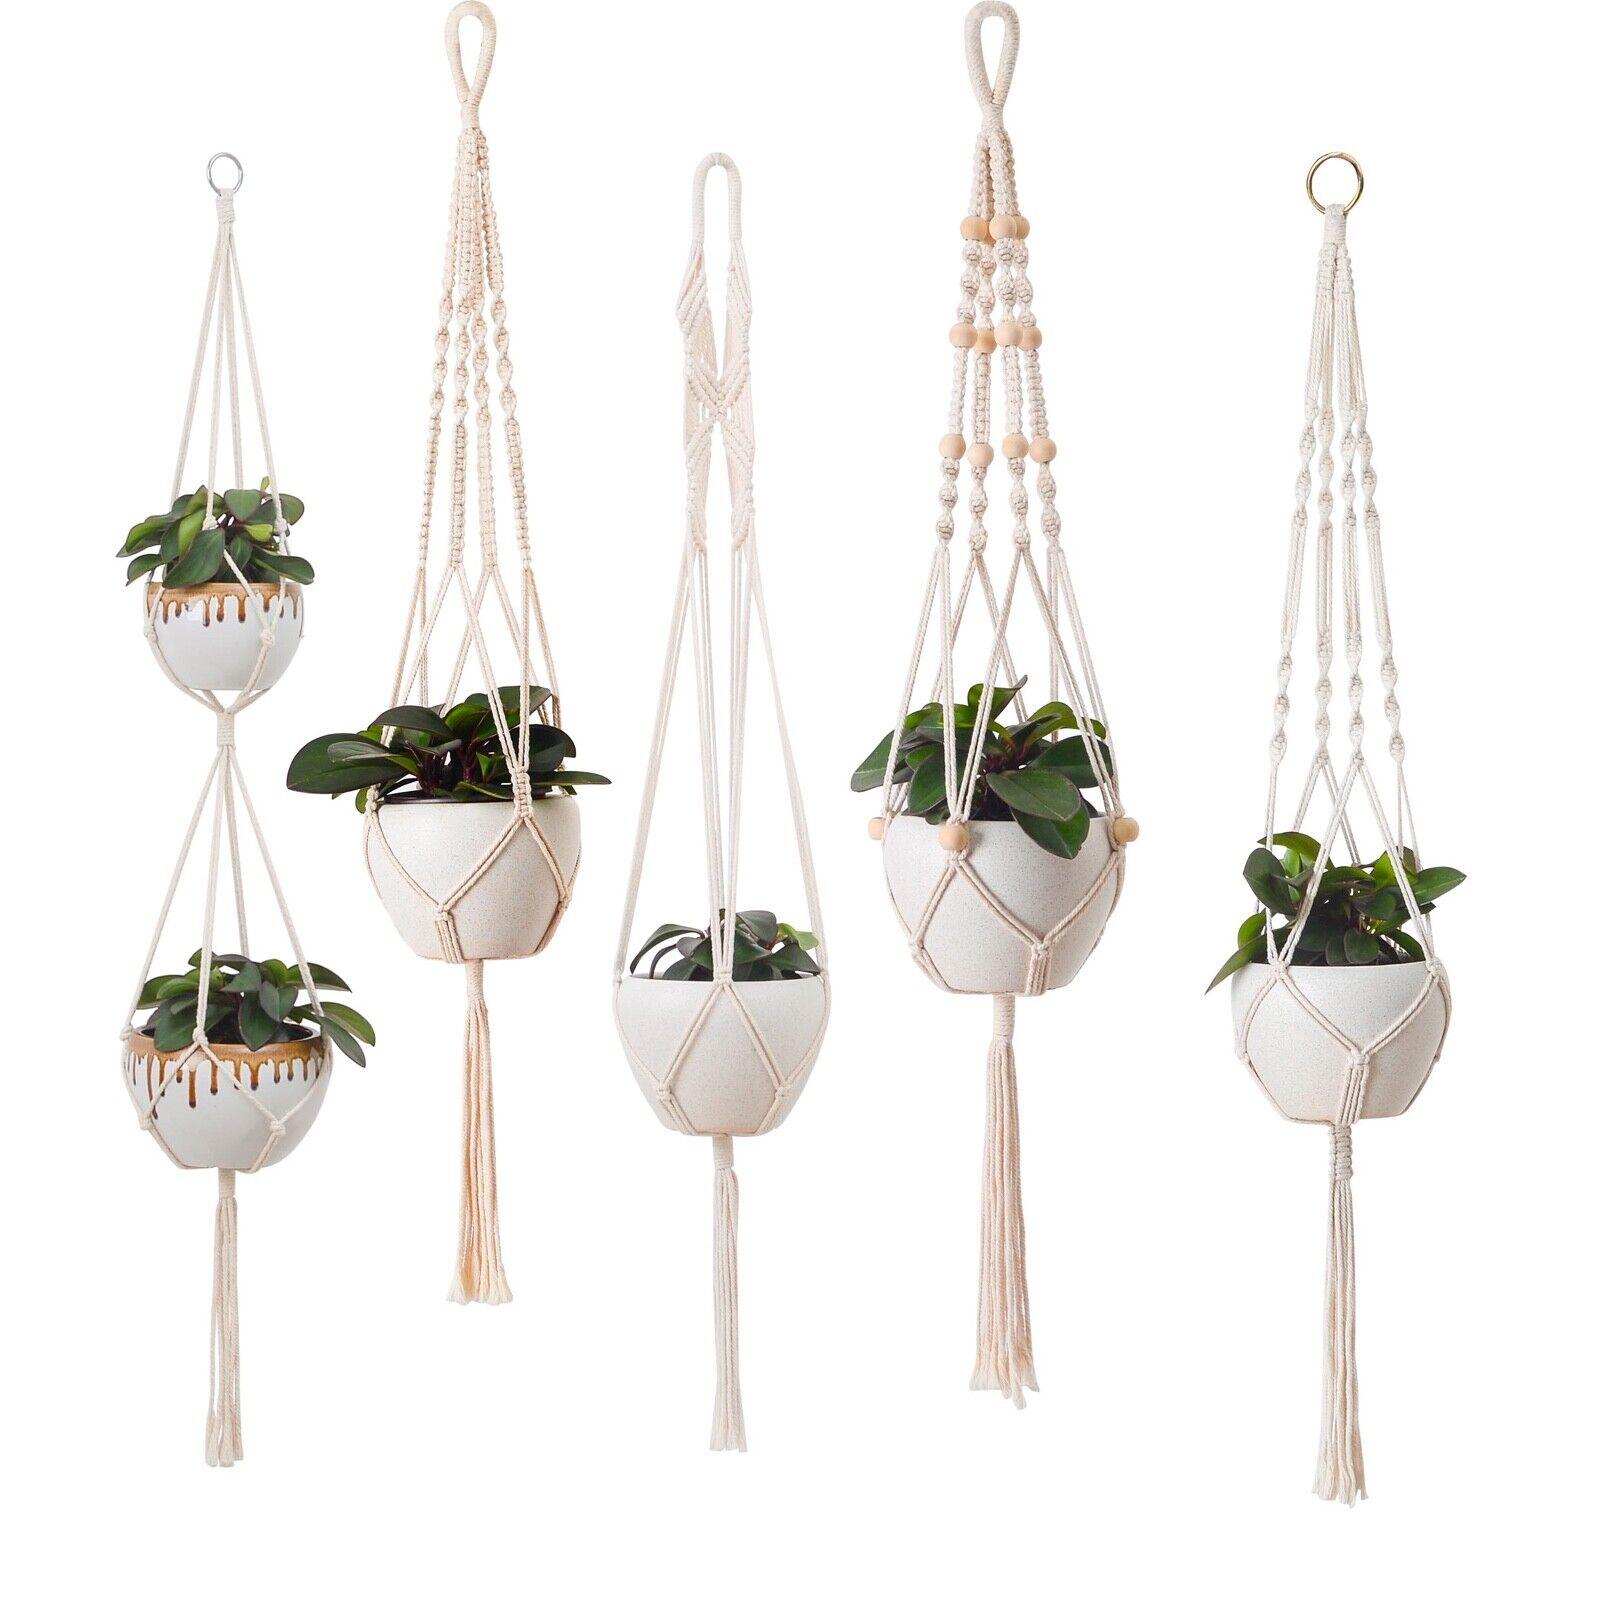 5 Piece Set Macrame Plant Hangers Macrame Plant Hanger With Hooks Home & Garden